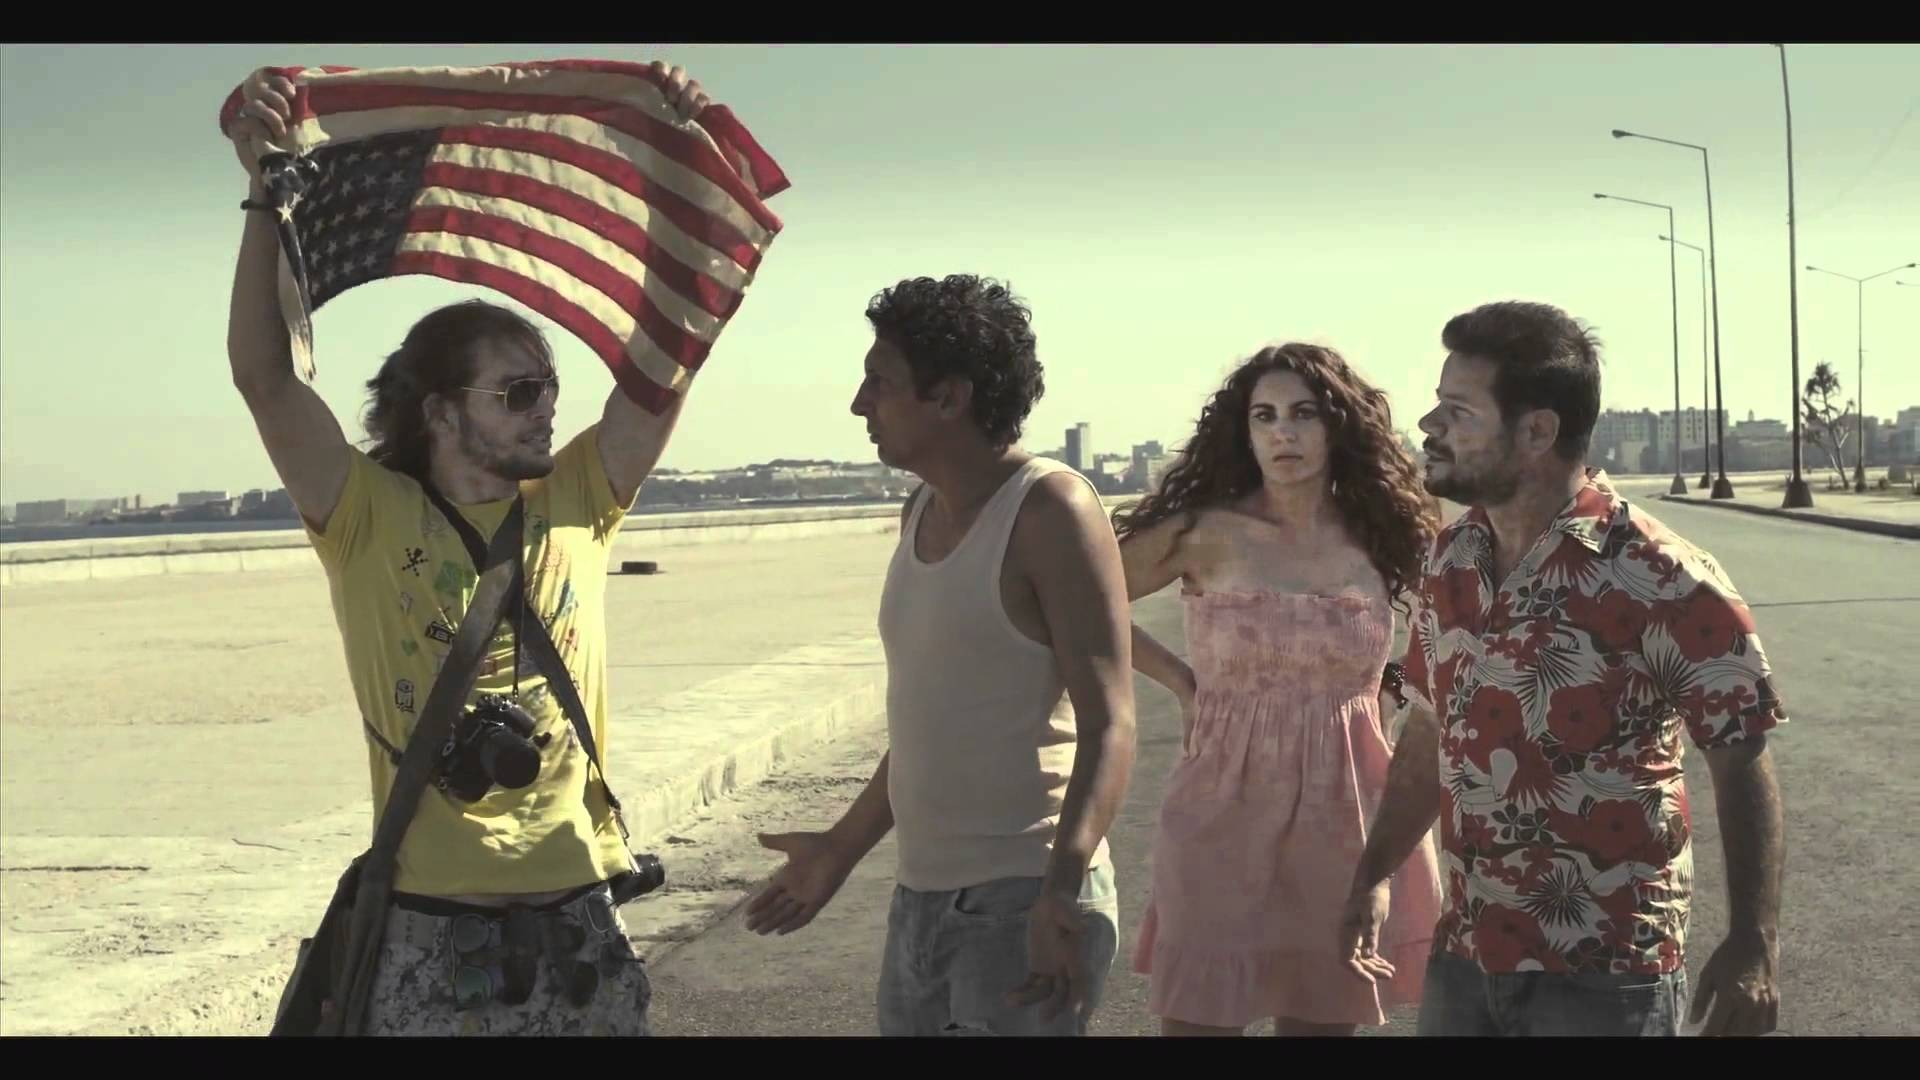 Juan de los M-Malecon Scene w_Amer Flag